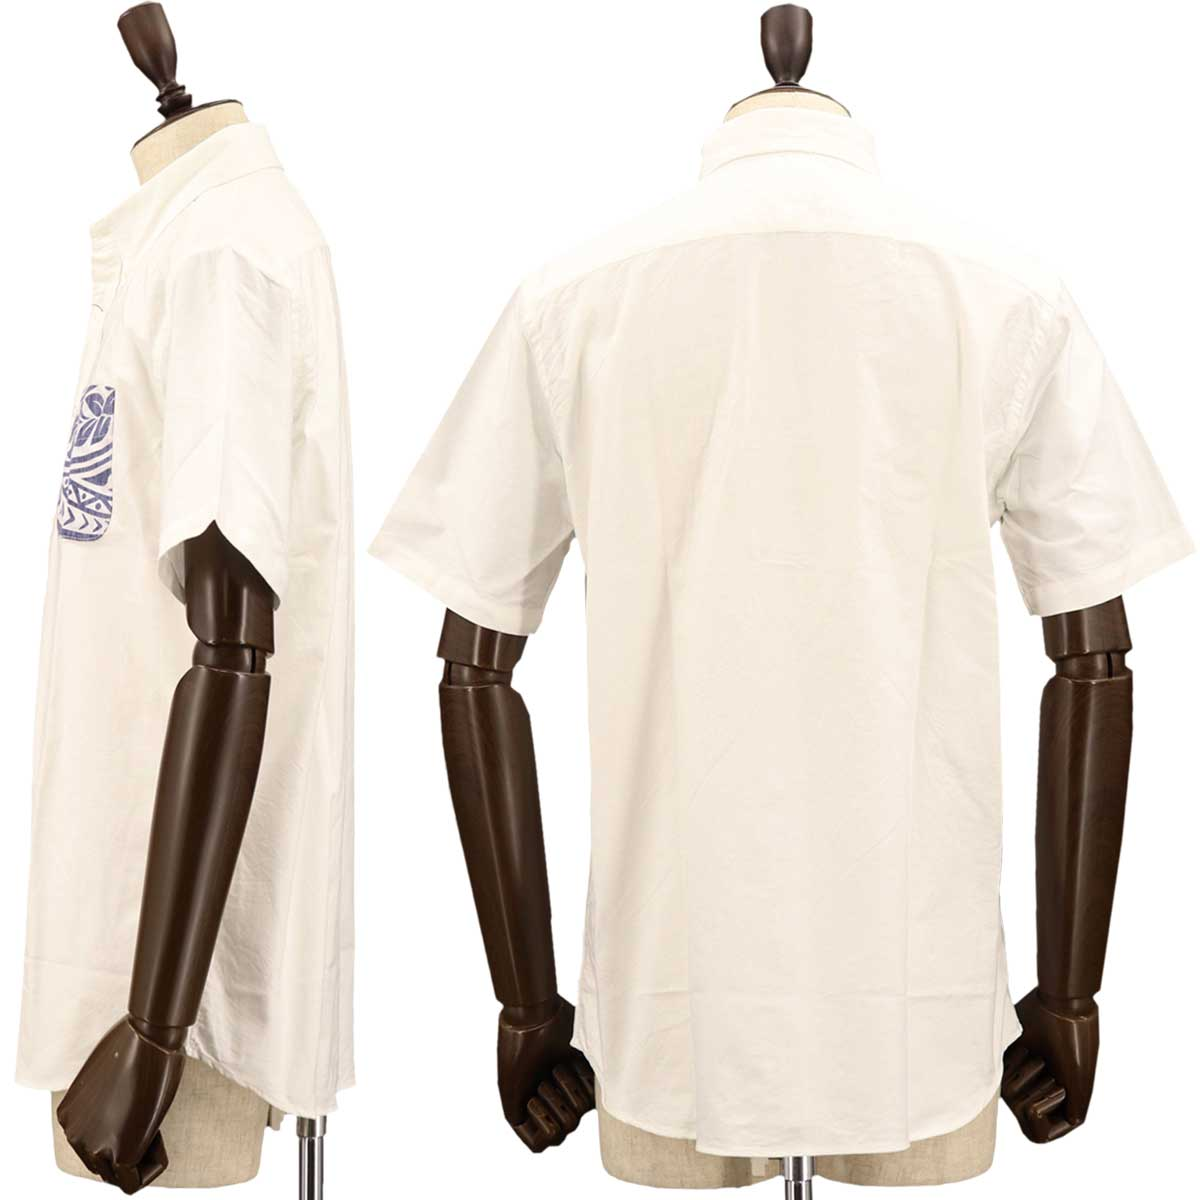 【50%OFF】オックスフォード アロハ柄 ボタンダウンシャツ(WHITE)